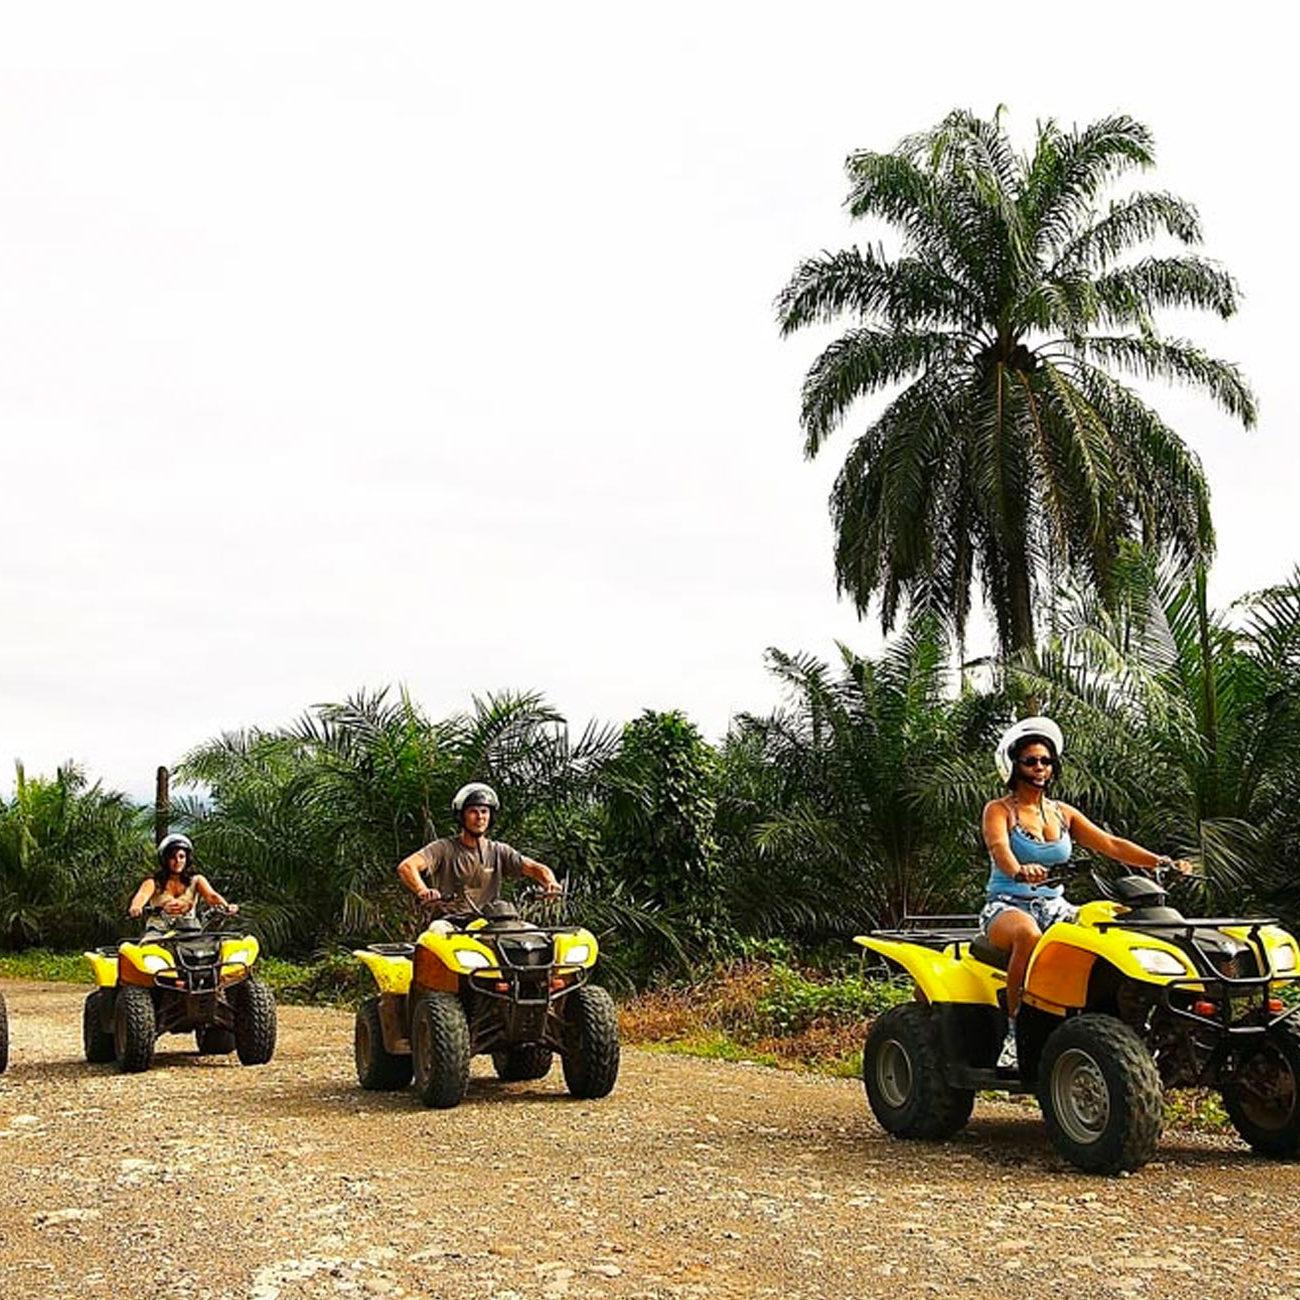 tours-atv-adventure-rainforest